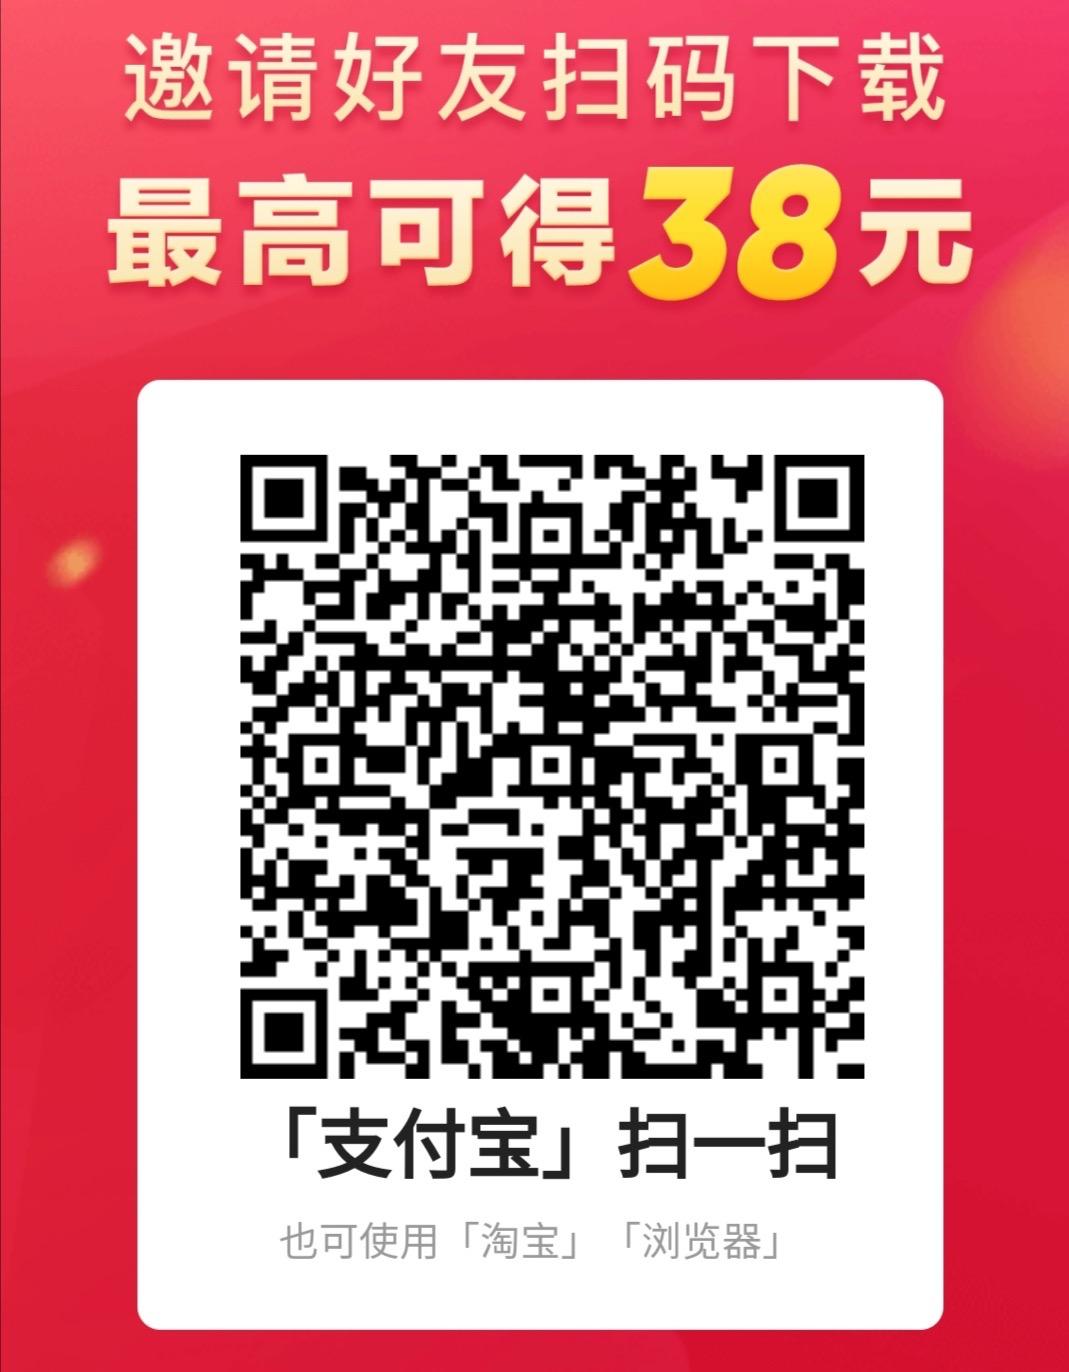 88AF168B-82E5-43B8-B974-FFB874CE222C.png